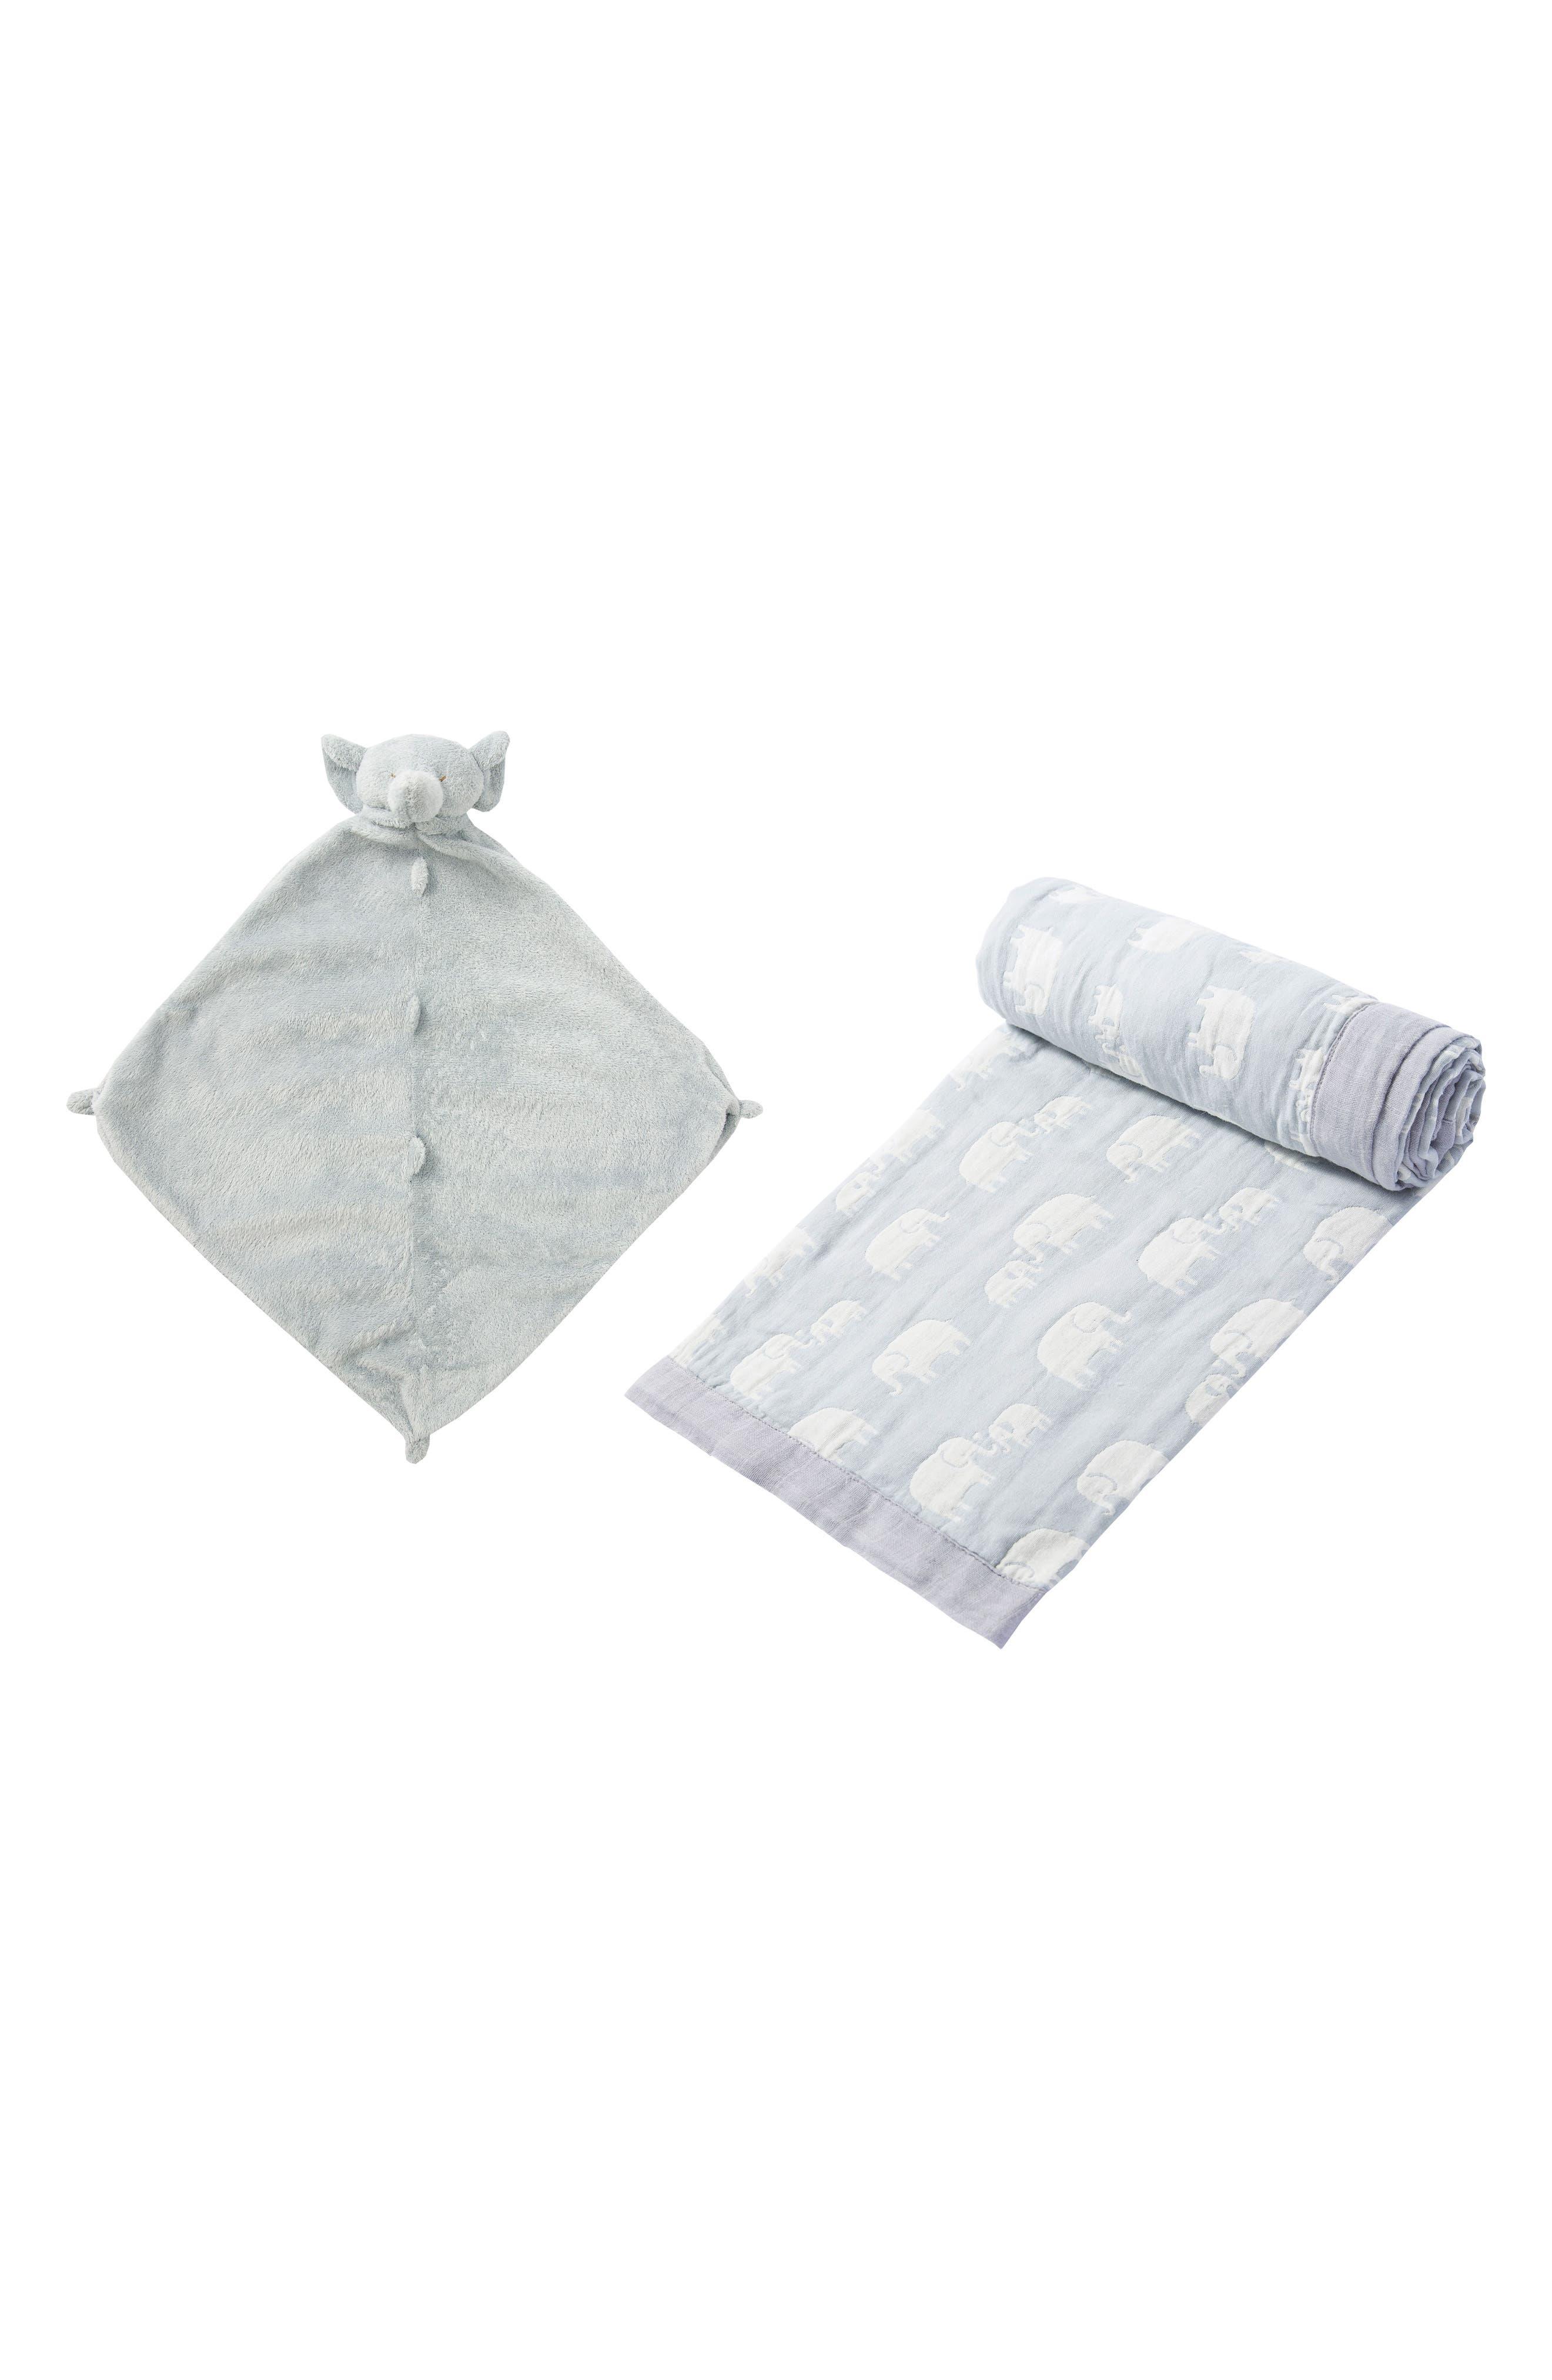 Jacquard Blanket & Blankie Set,                             Main thumbnail 1, color,                             Elephant